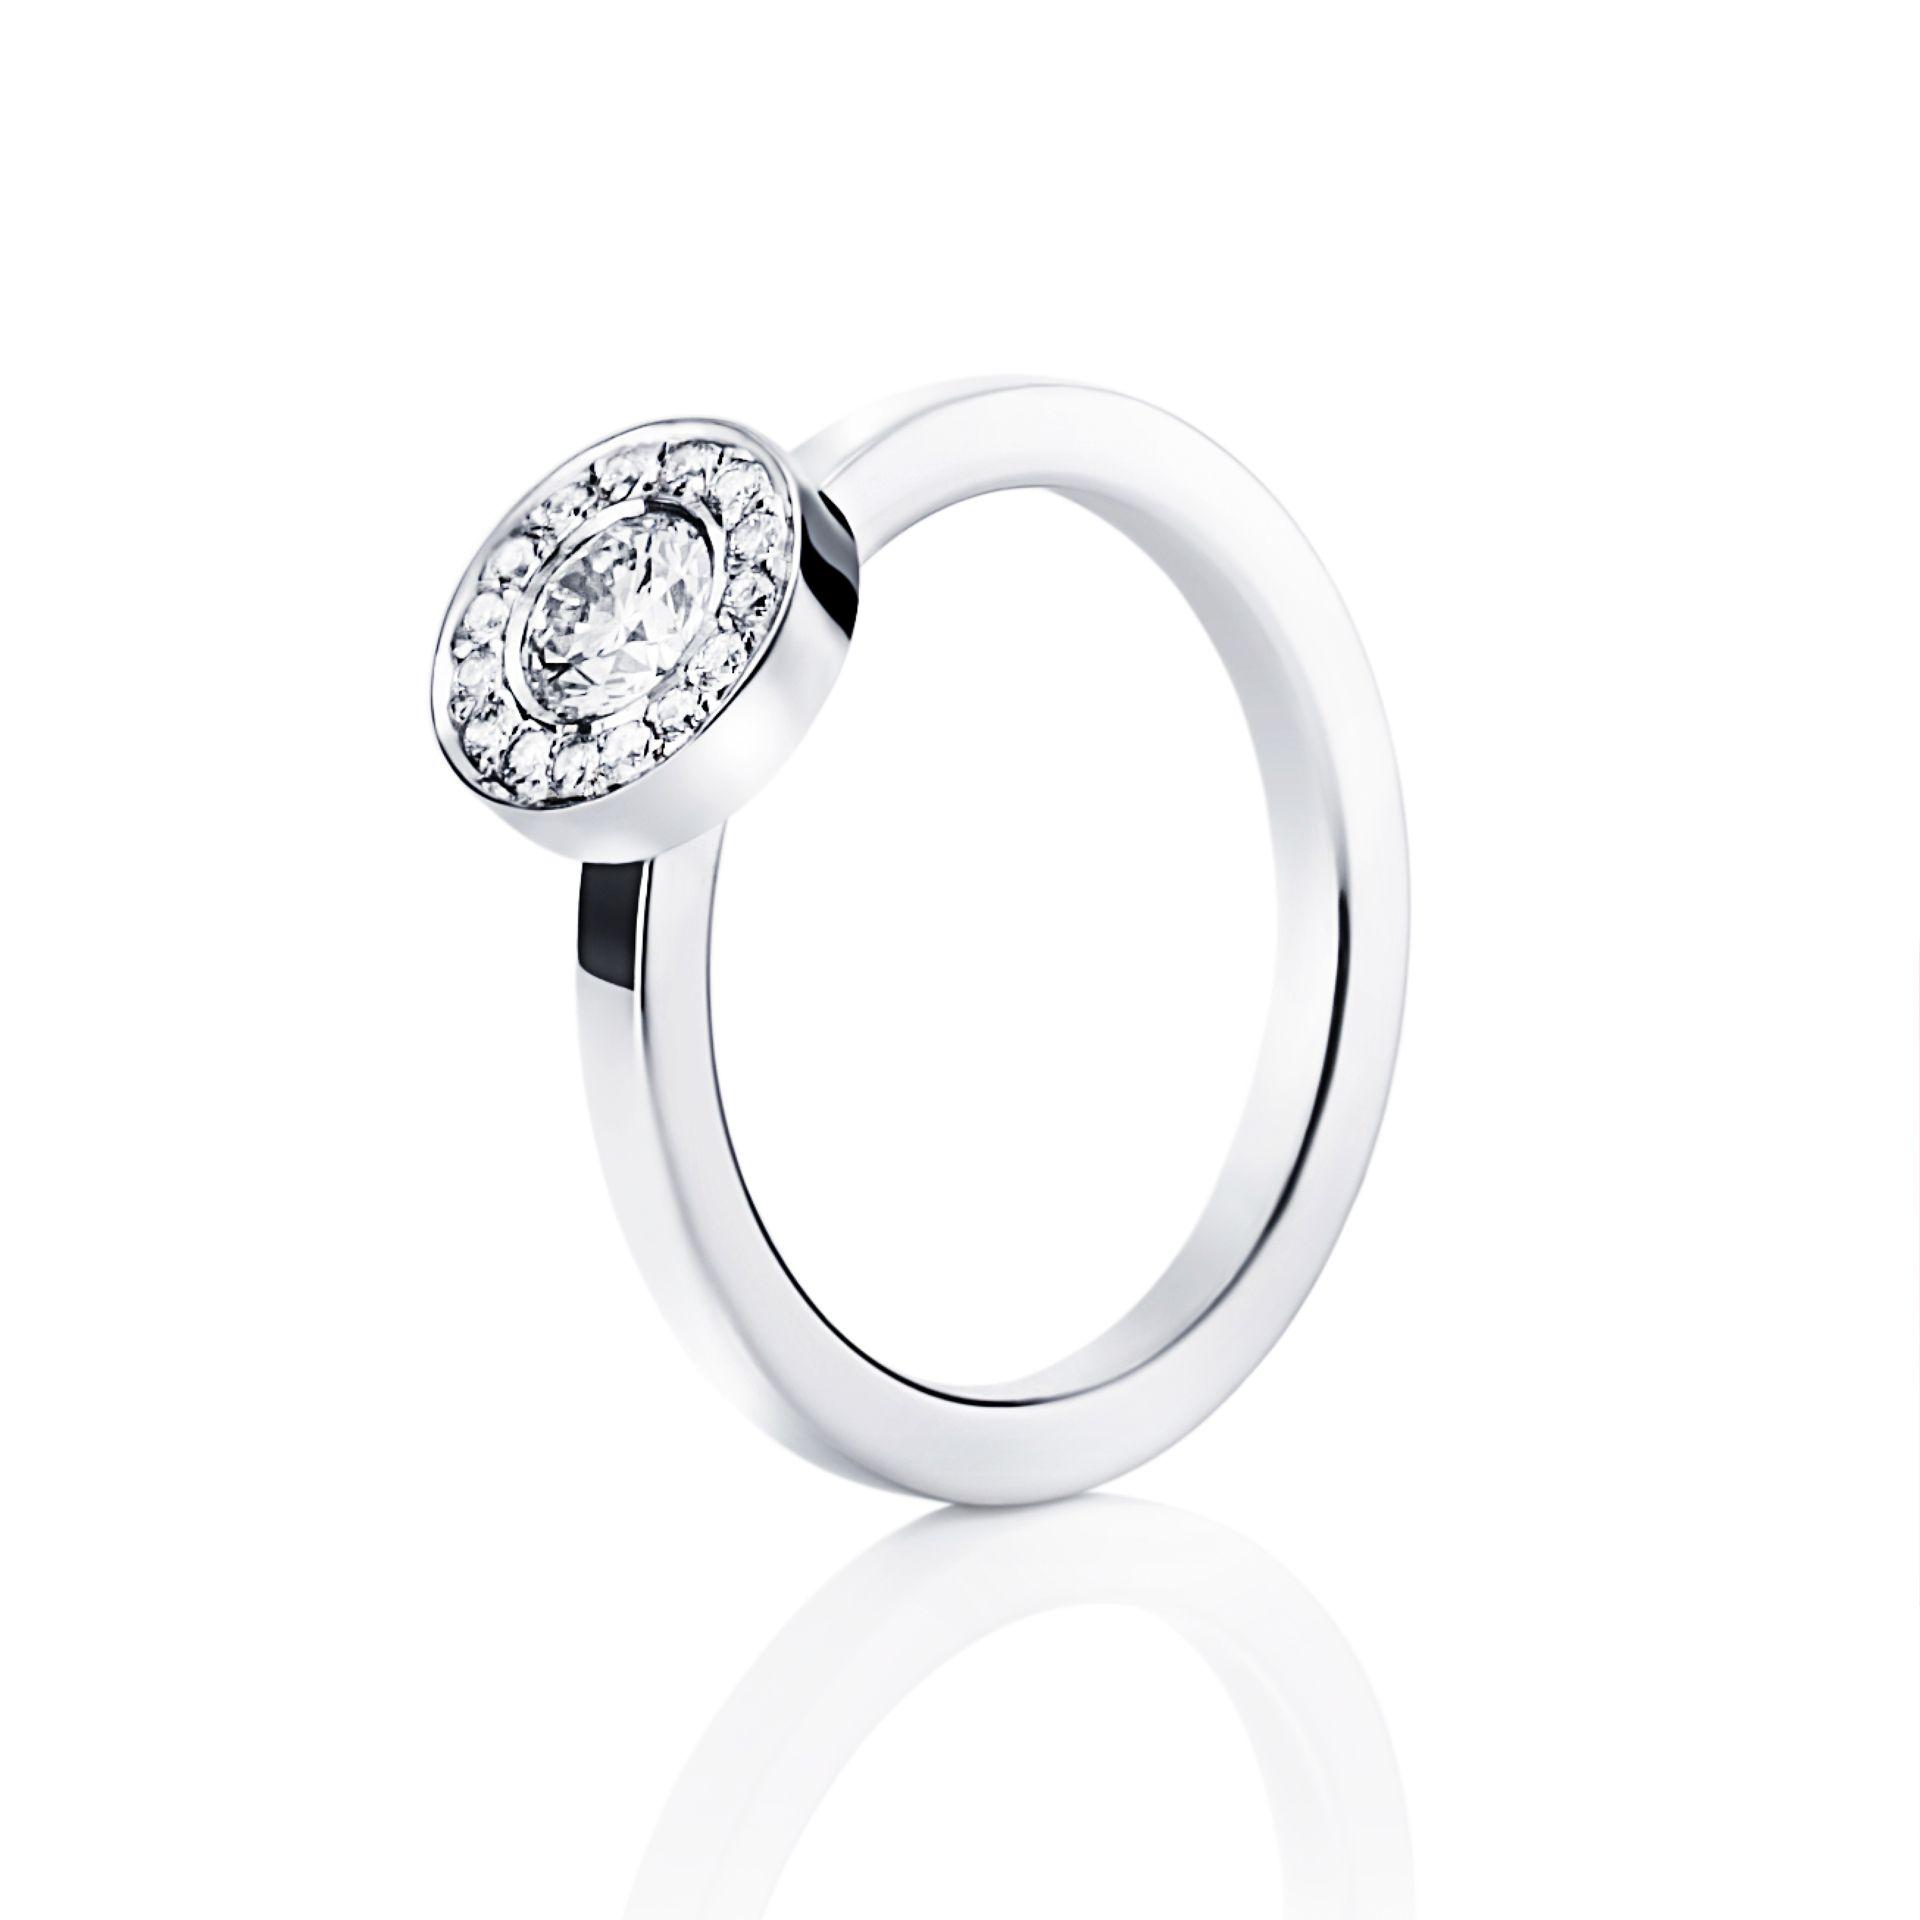 WEDDING & STARS RING 0.40 CT